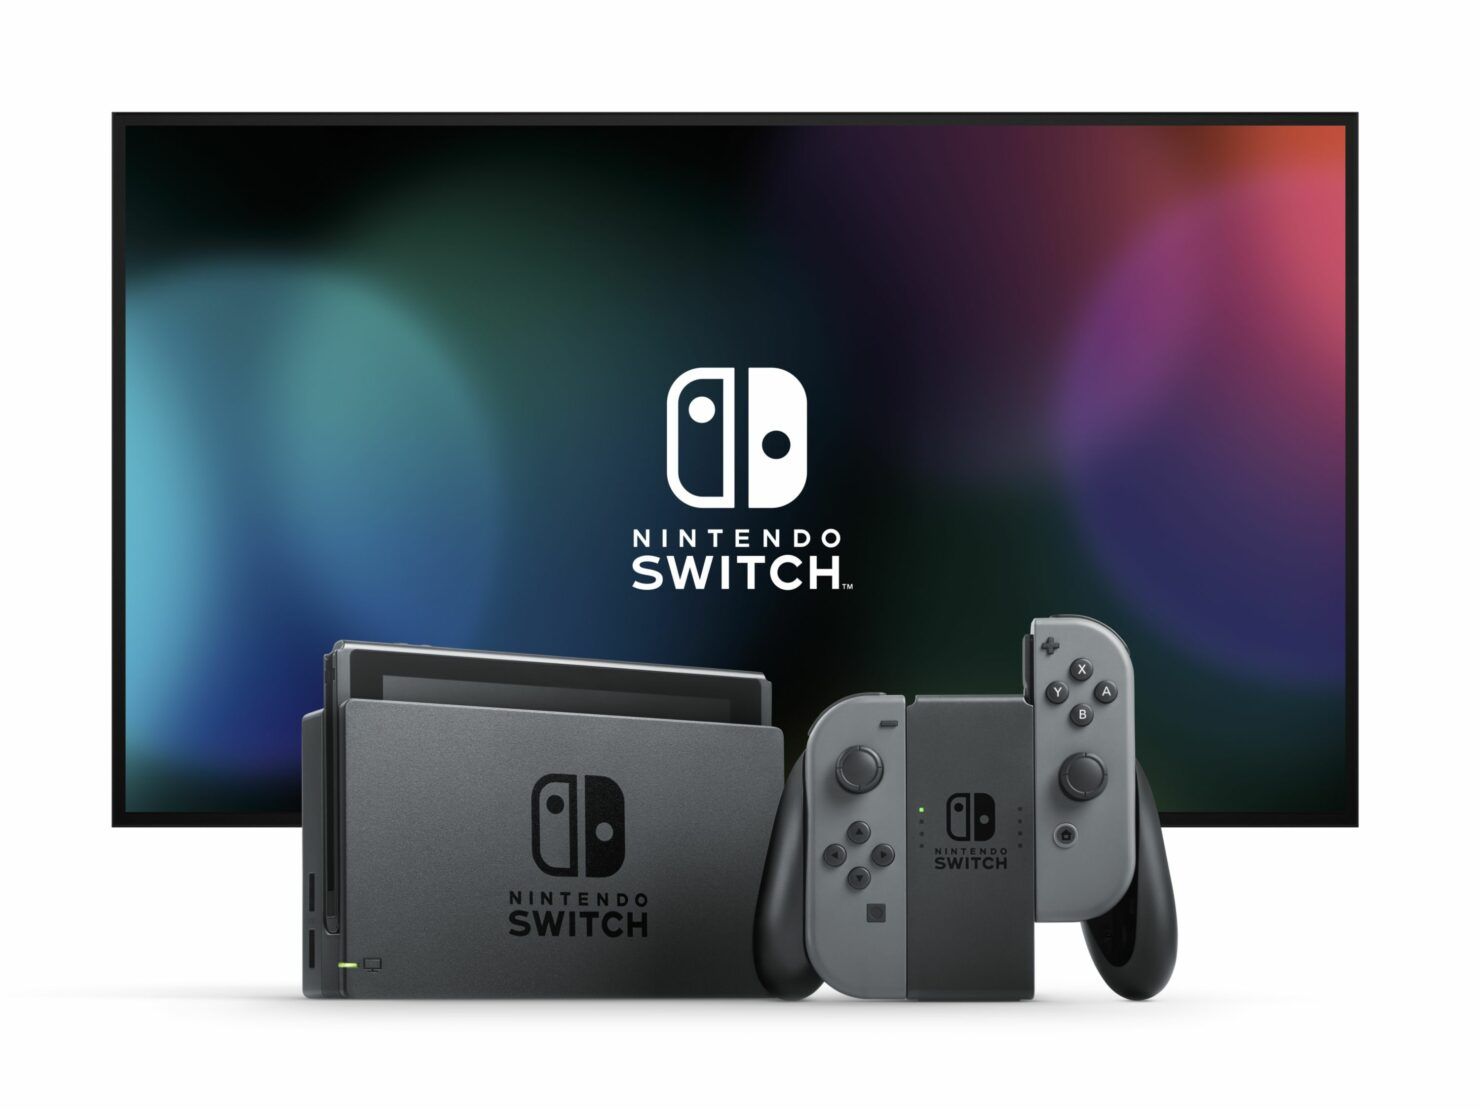 Nintendo Switch 5.0.0 update